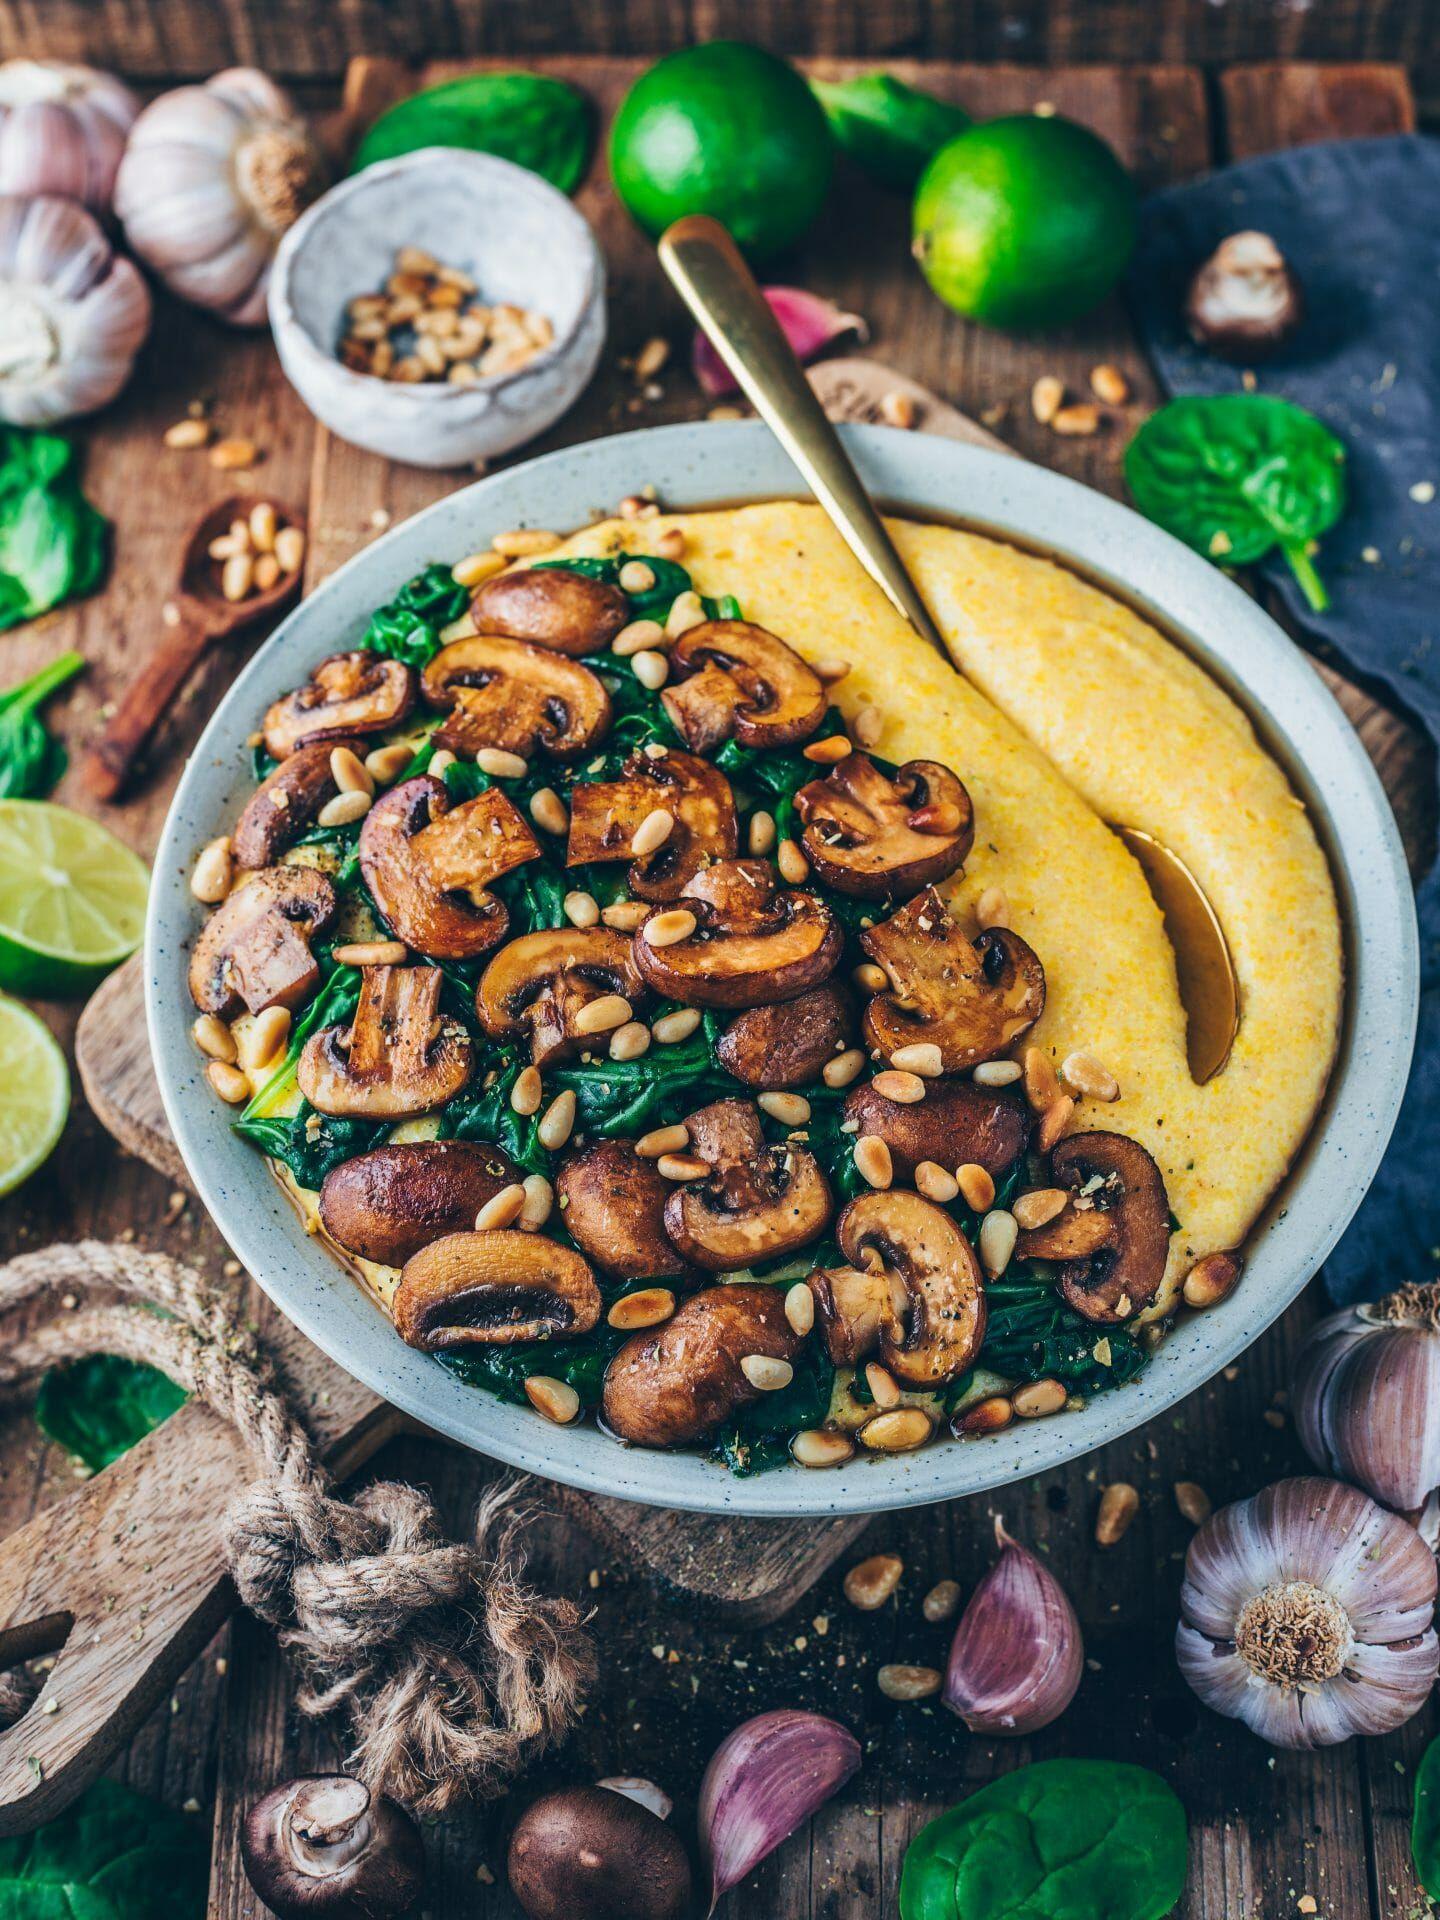 Creamy Vegan Polenta with Mushrooms and Spinach -